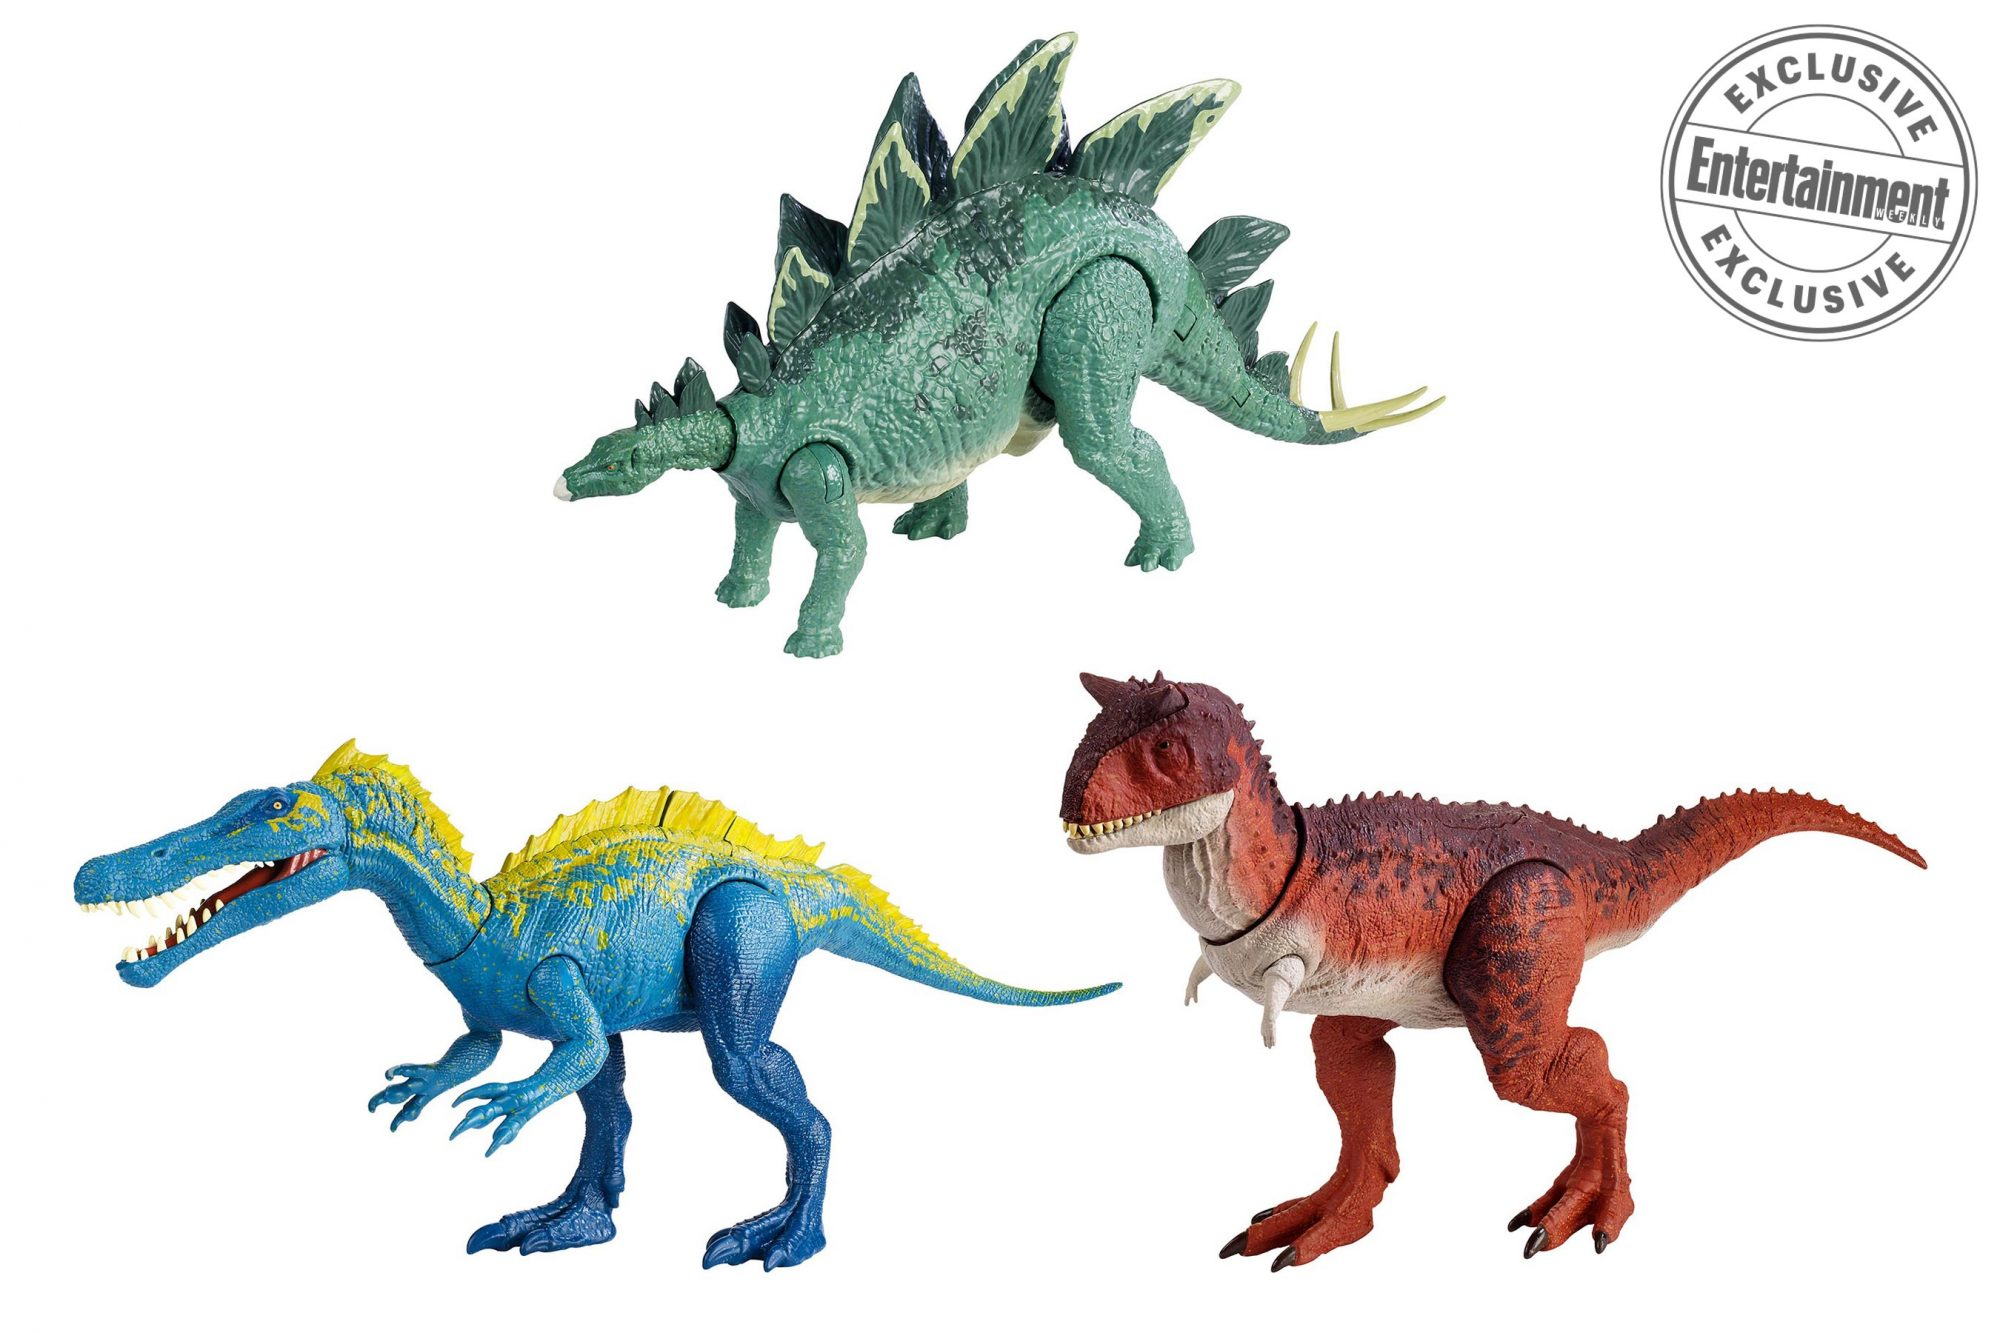 2018 Mattel Jurassic World Fallen Kingdom 3-Pack Mini Action Dinos Exclusive